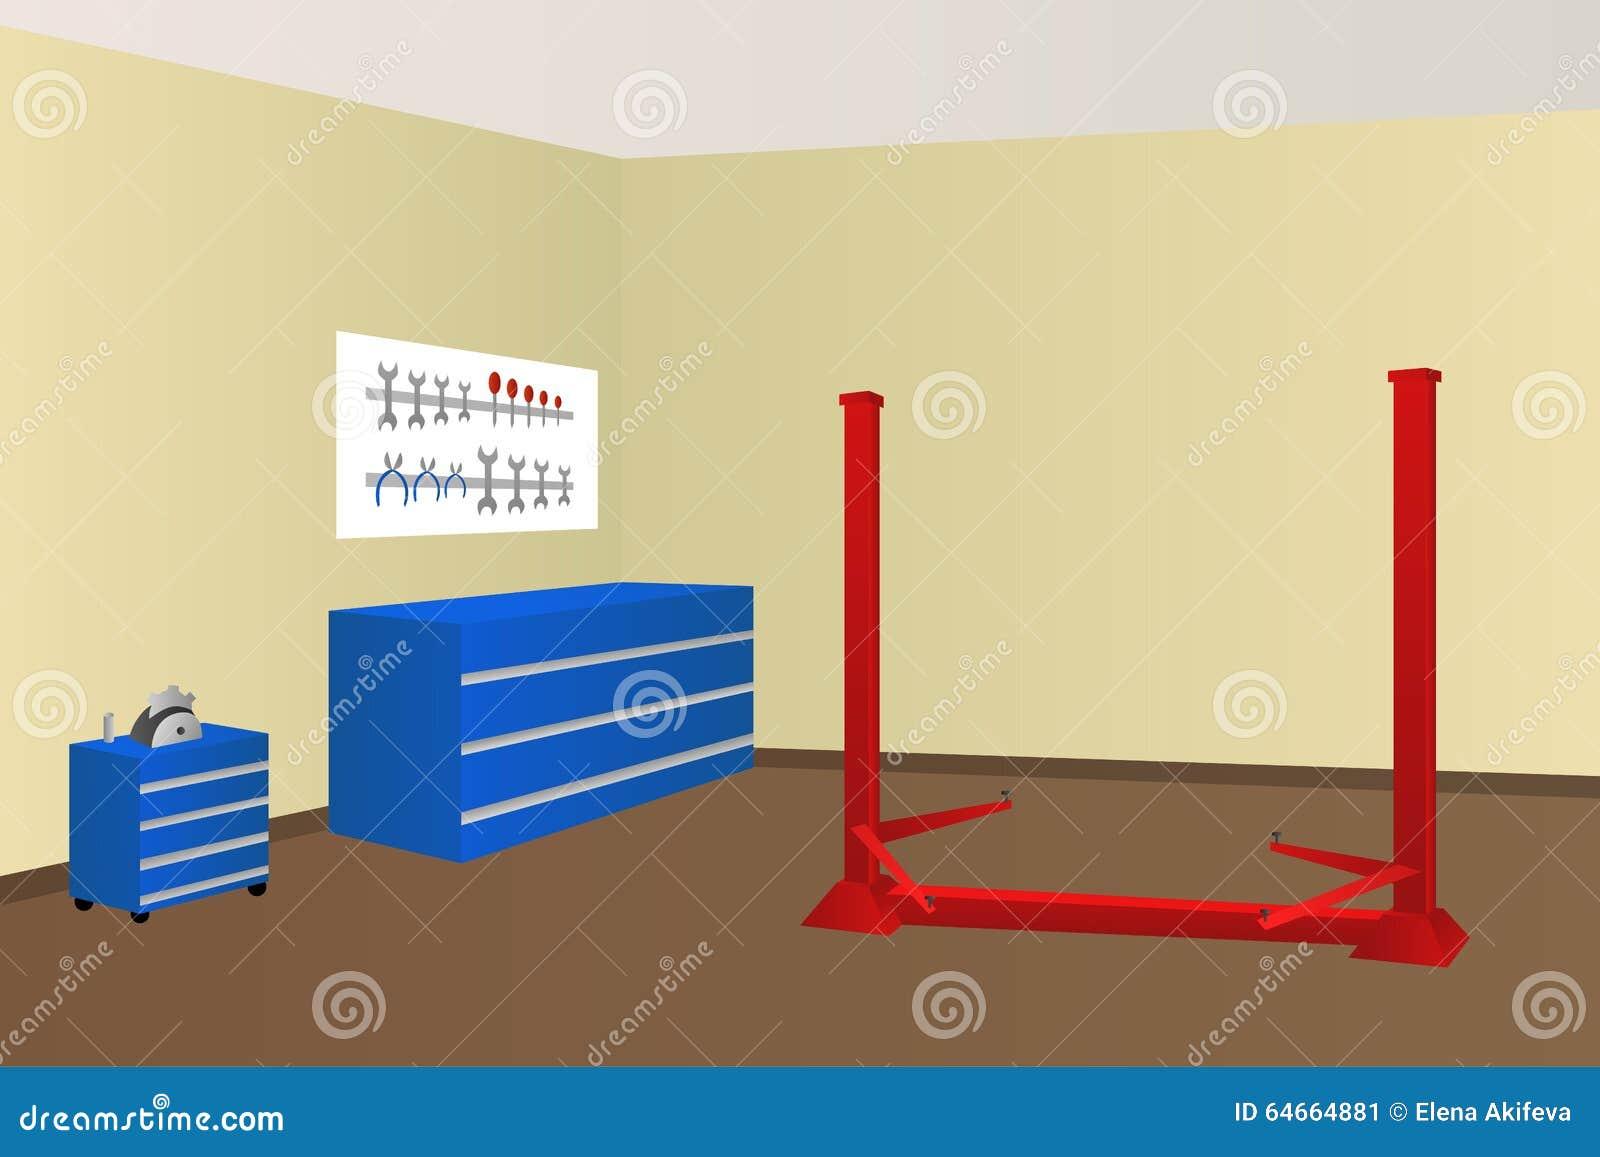 Garage Auto Repair Room Illustration Stock Vector